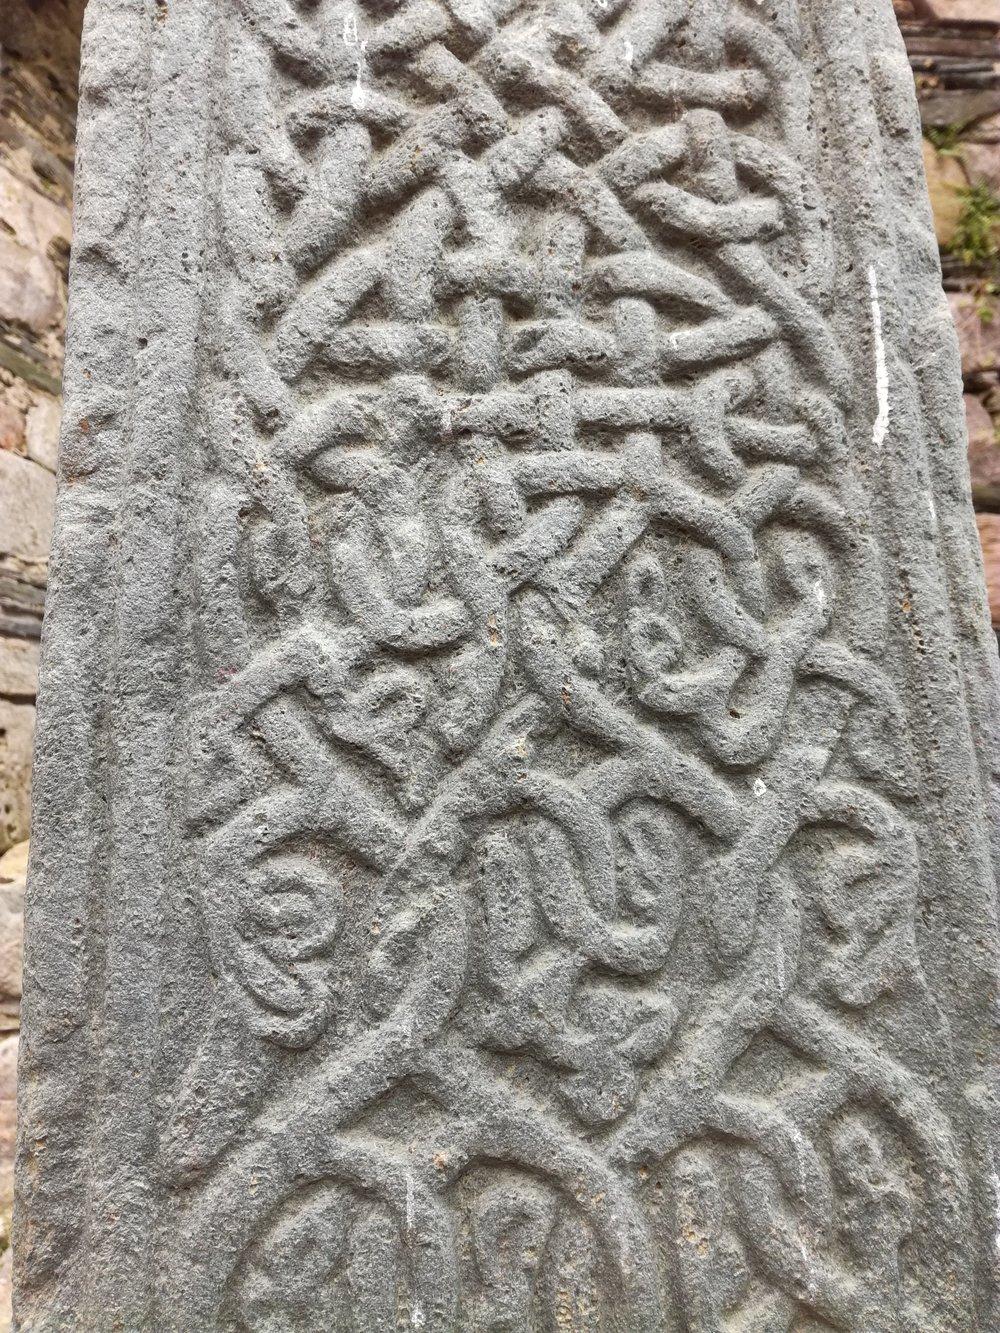 Celtic engraved stone slab, Argyll -  Tour & Walk in small groups - Roaming Scotland.jpg